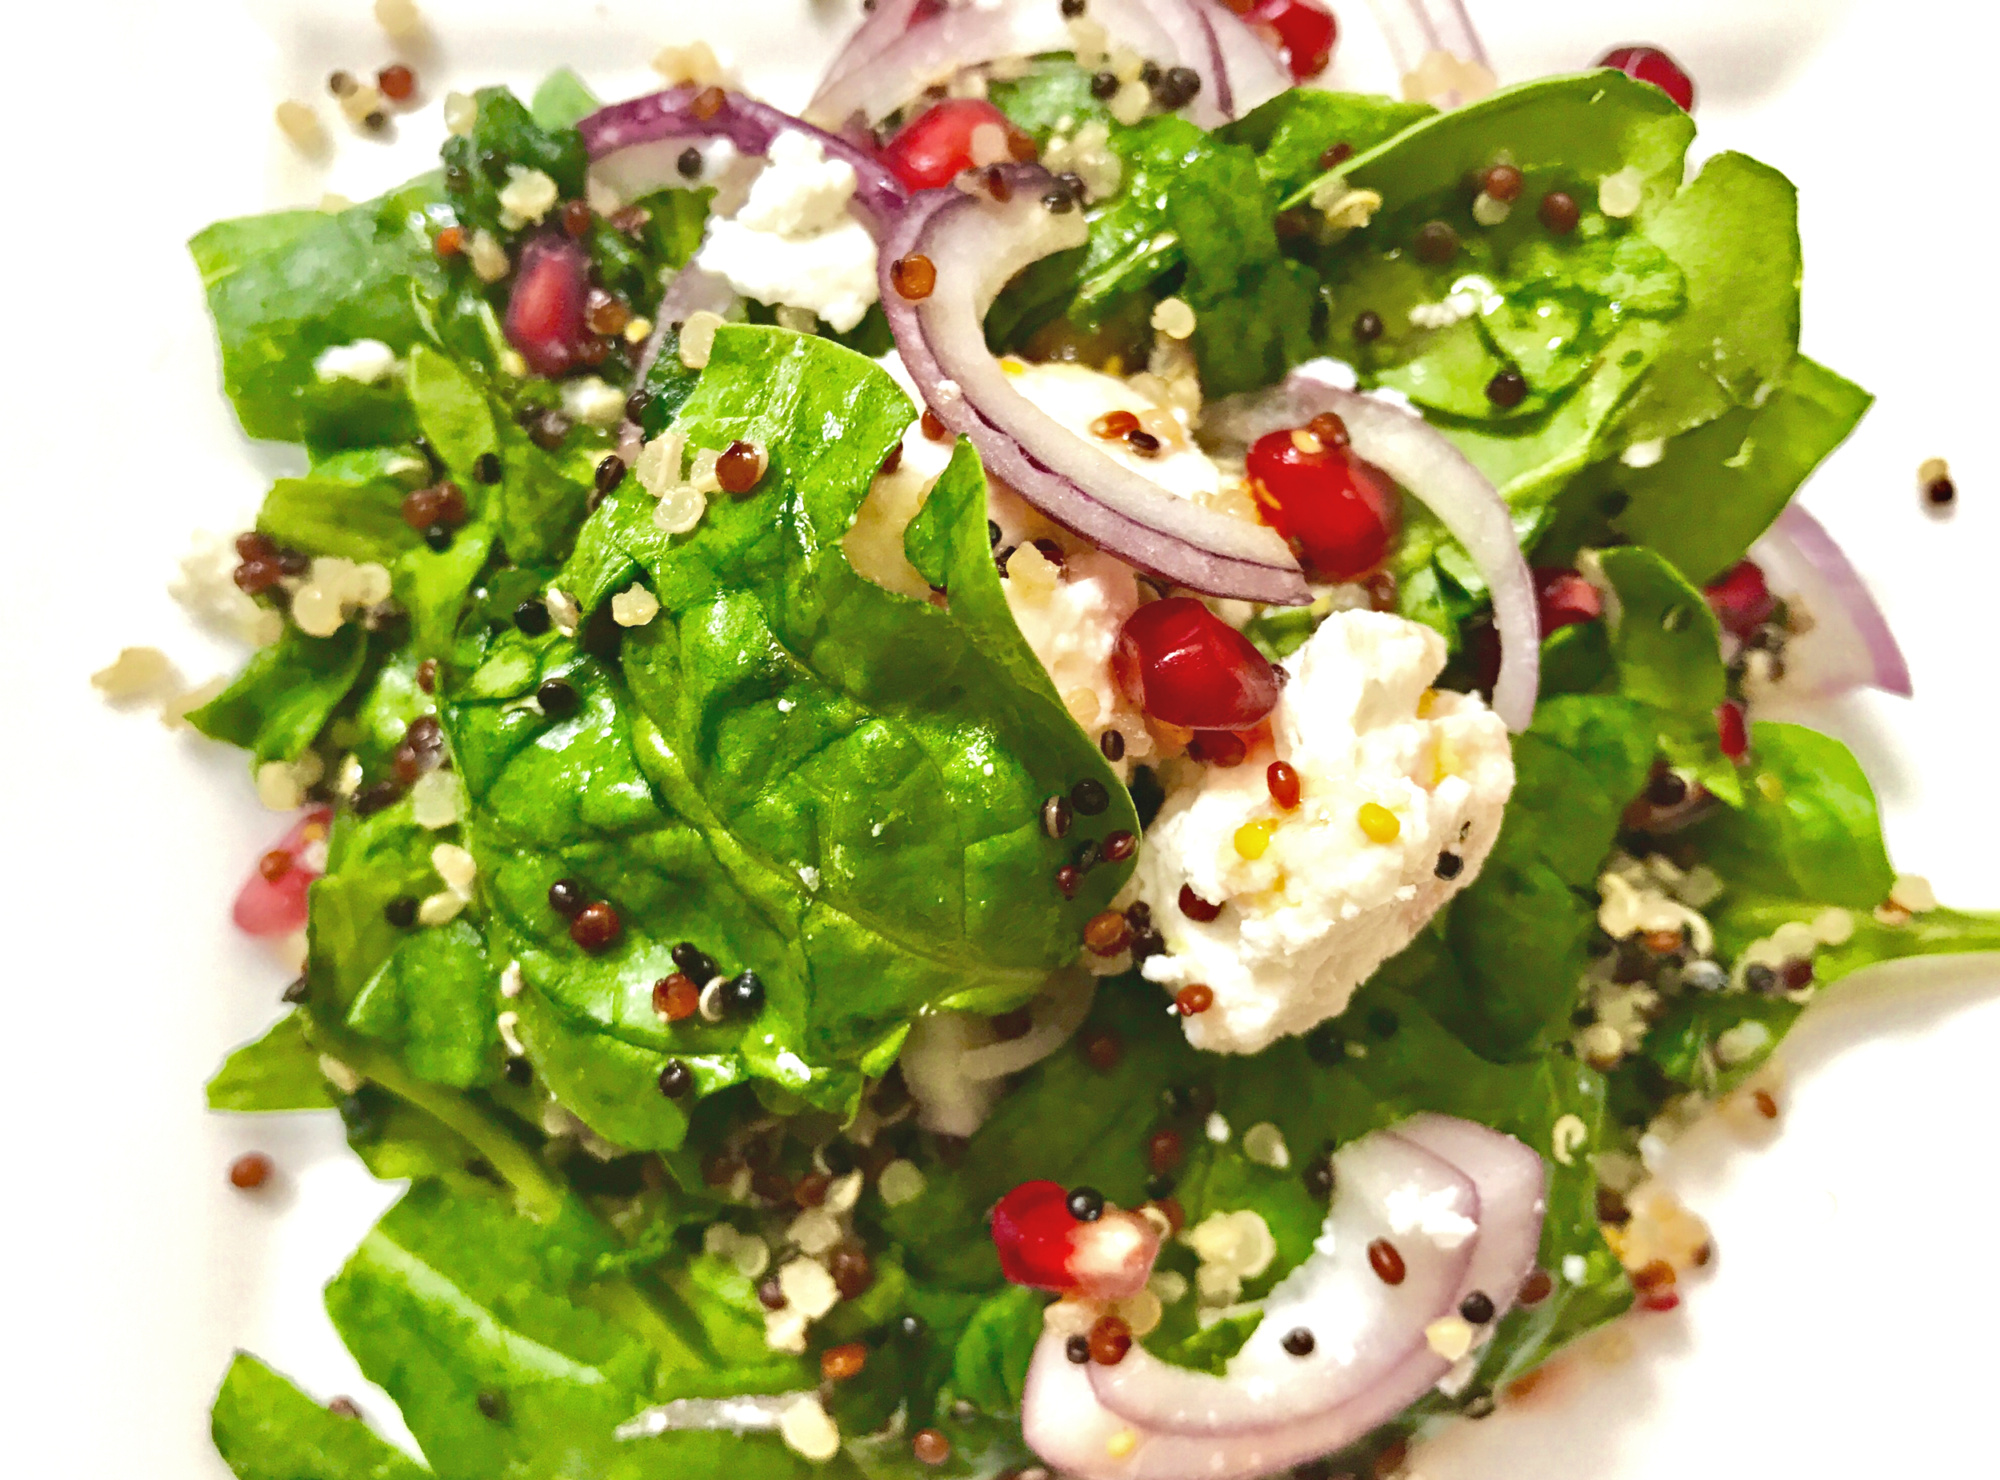 SugarDoctor Recipe Spinach and Pomegranate Salad